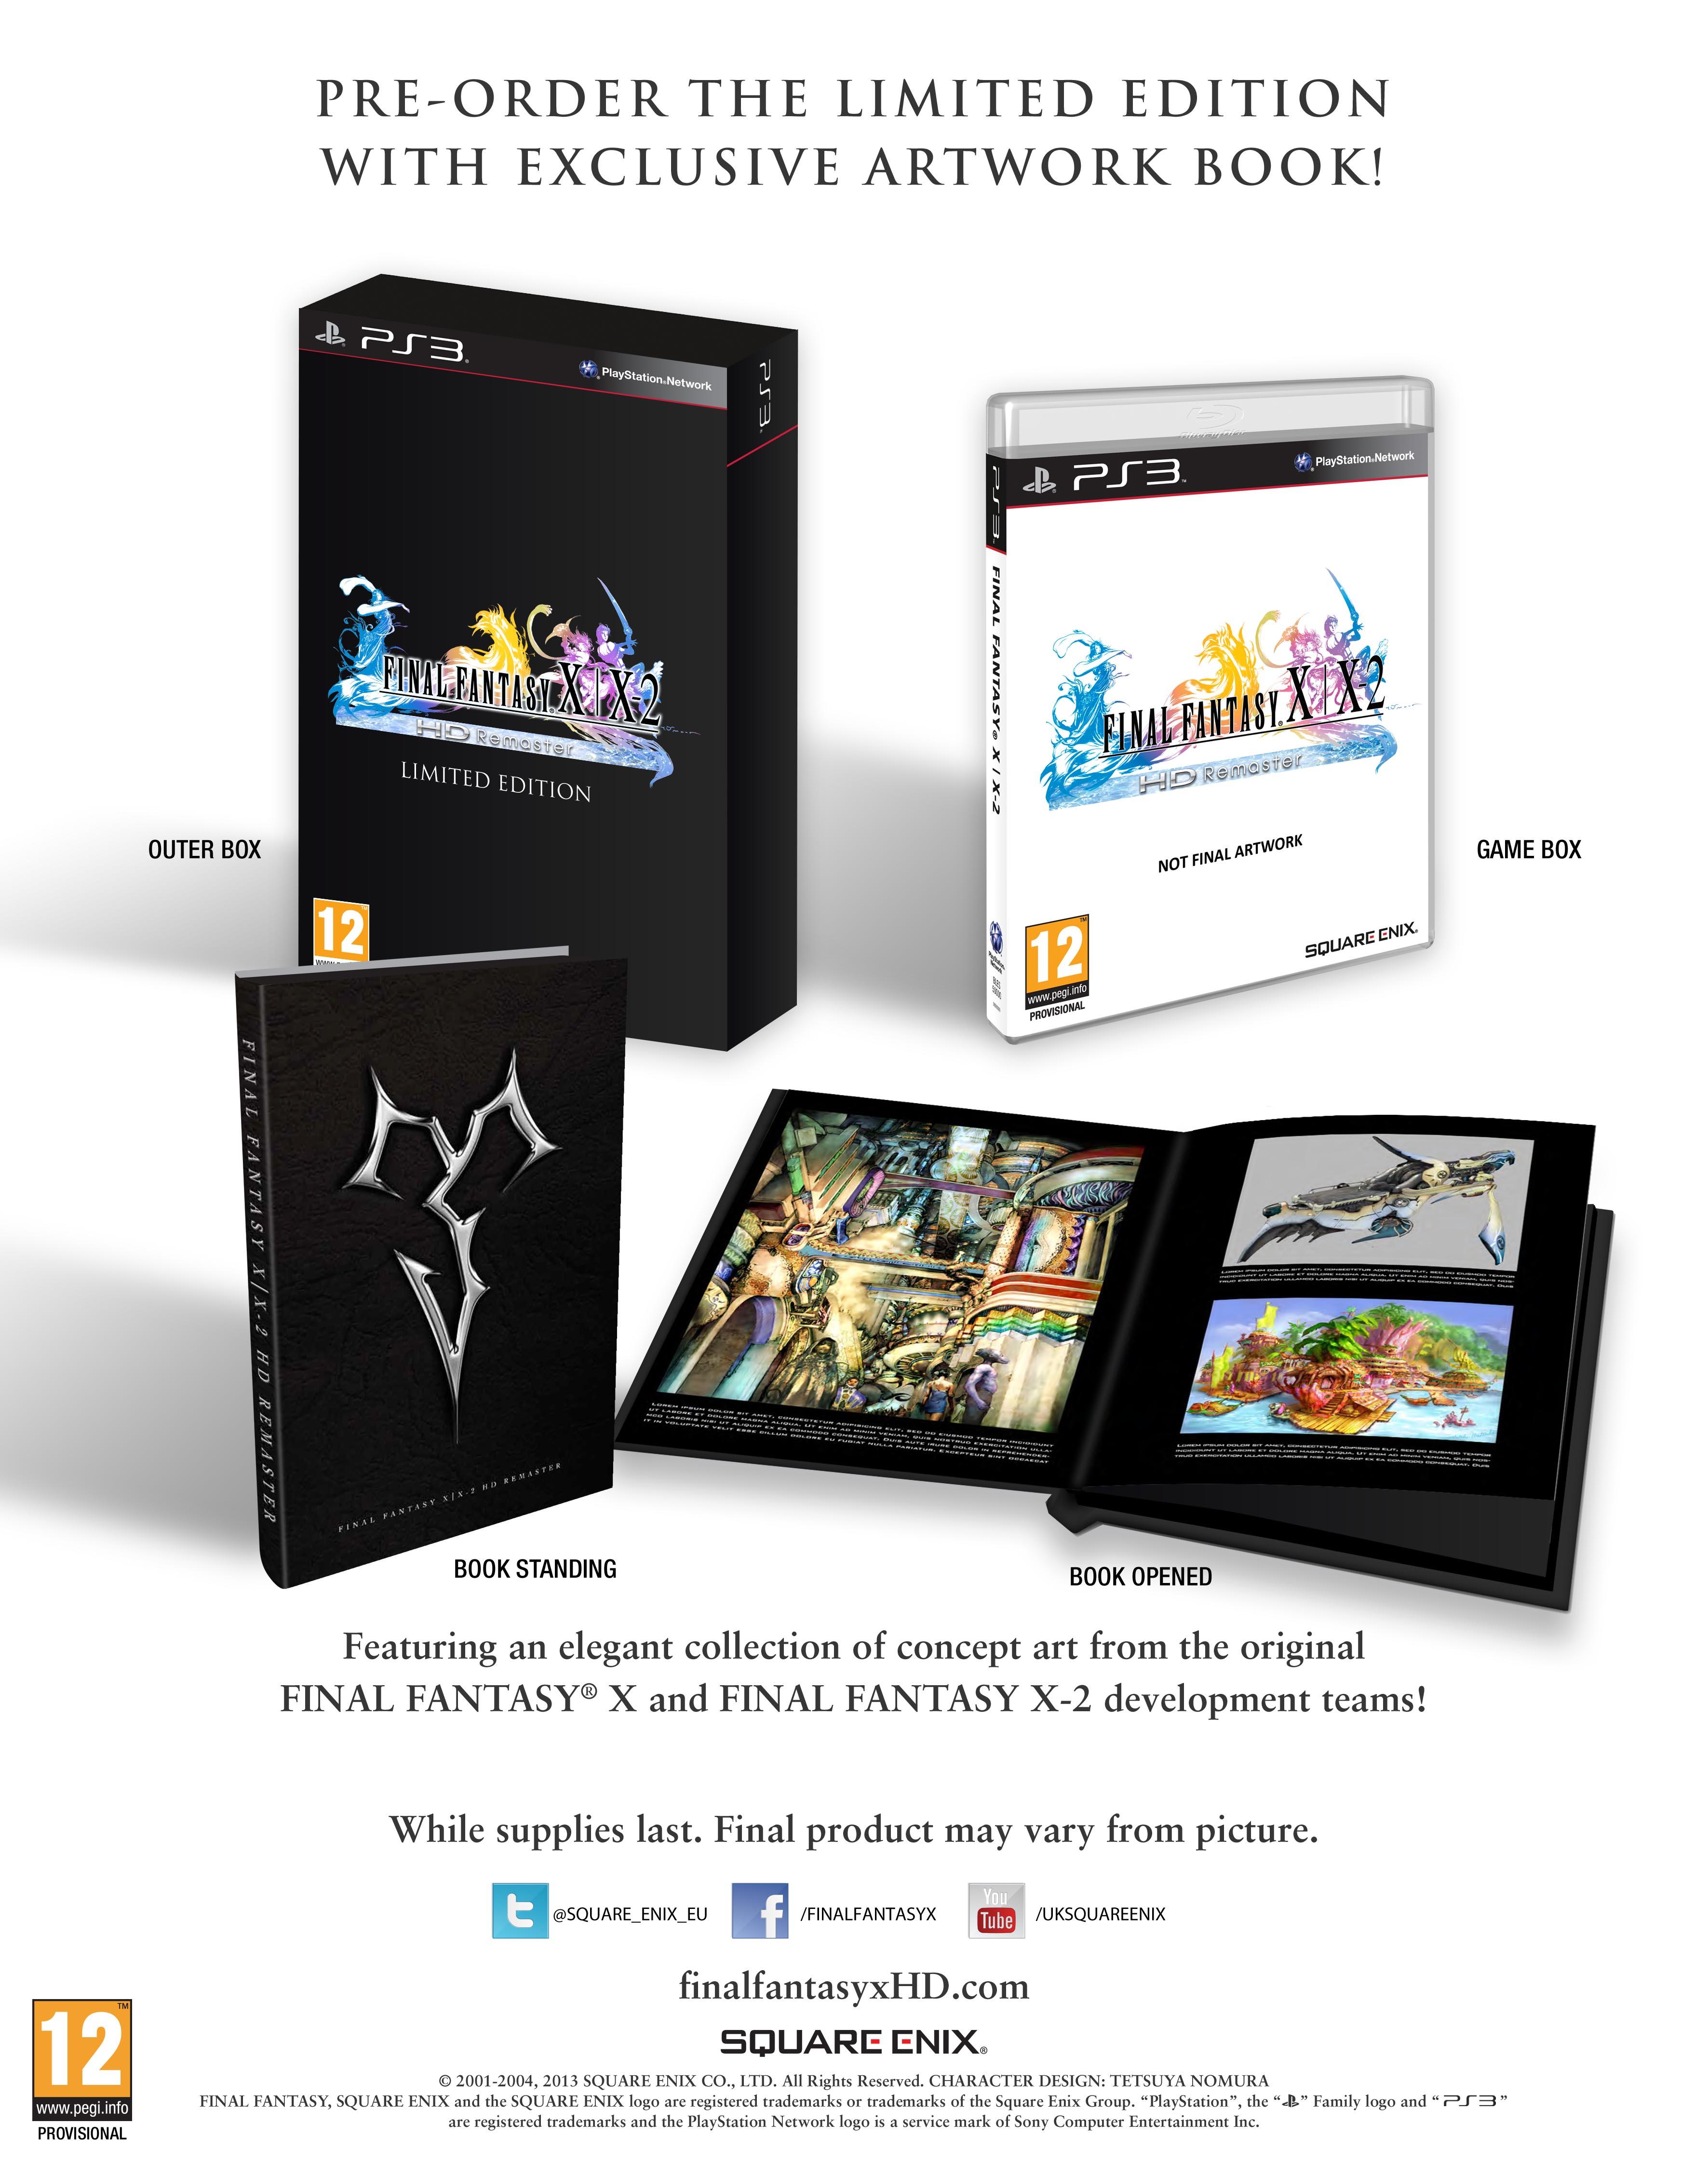 Buy final fantasy x x-2 hd remaster limited edition on playstation.